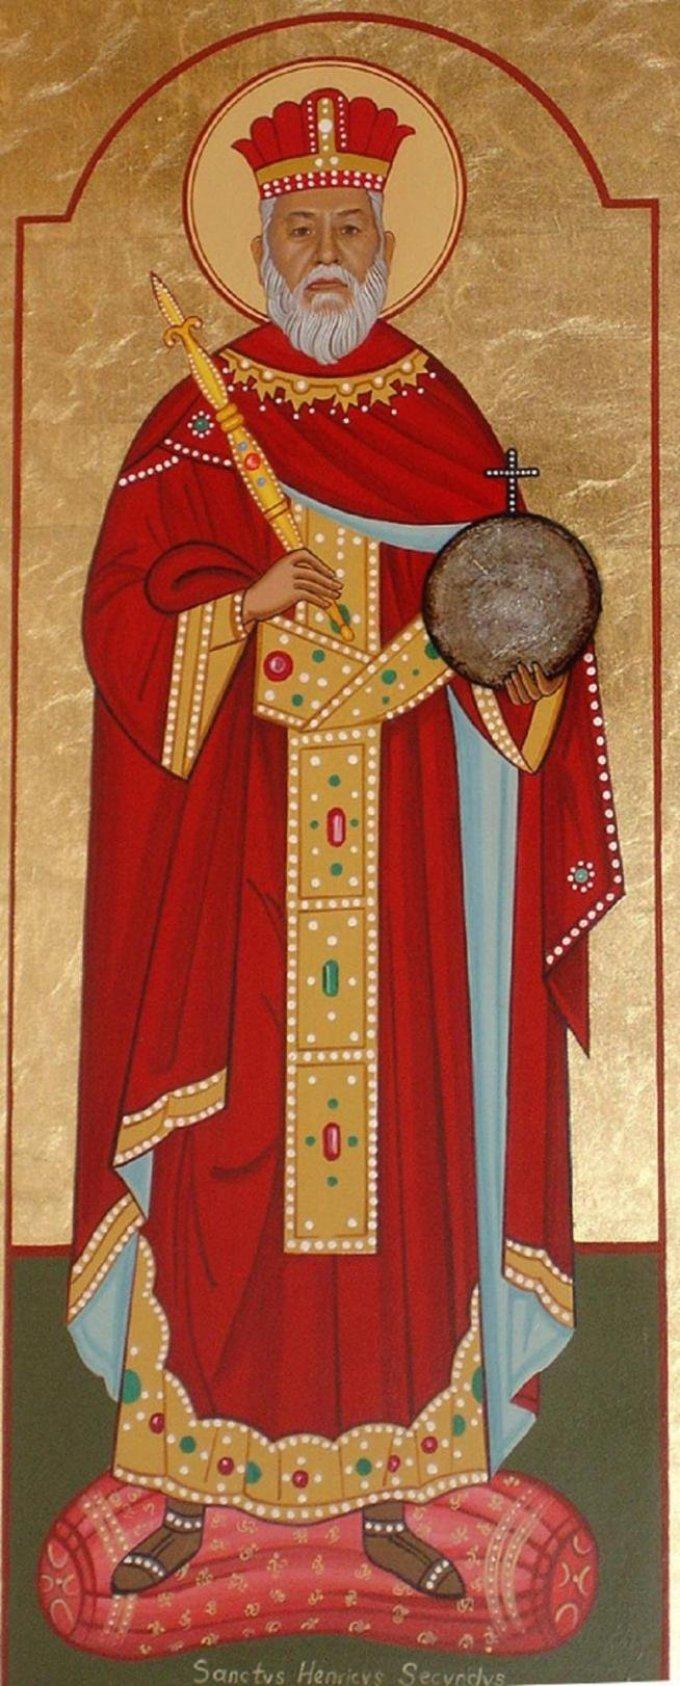 Le 13 juillet : Saint Henri II